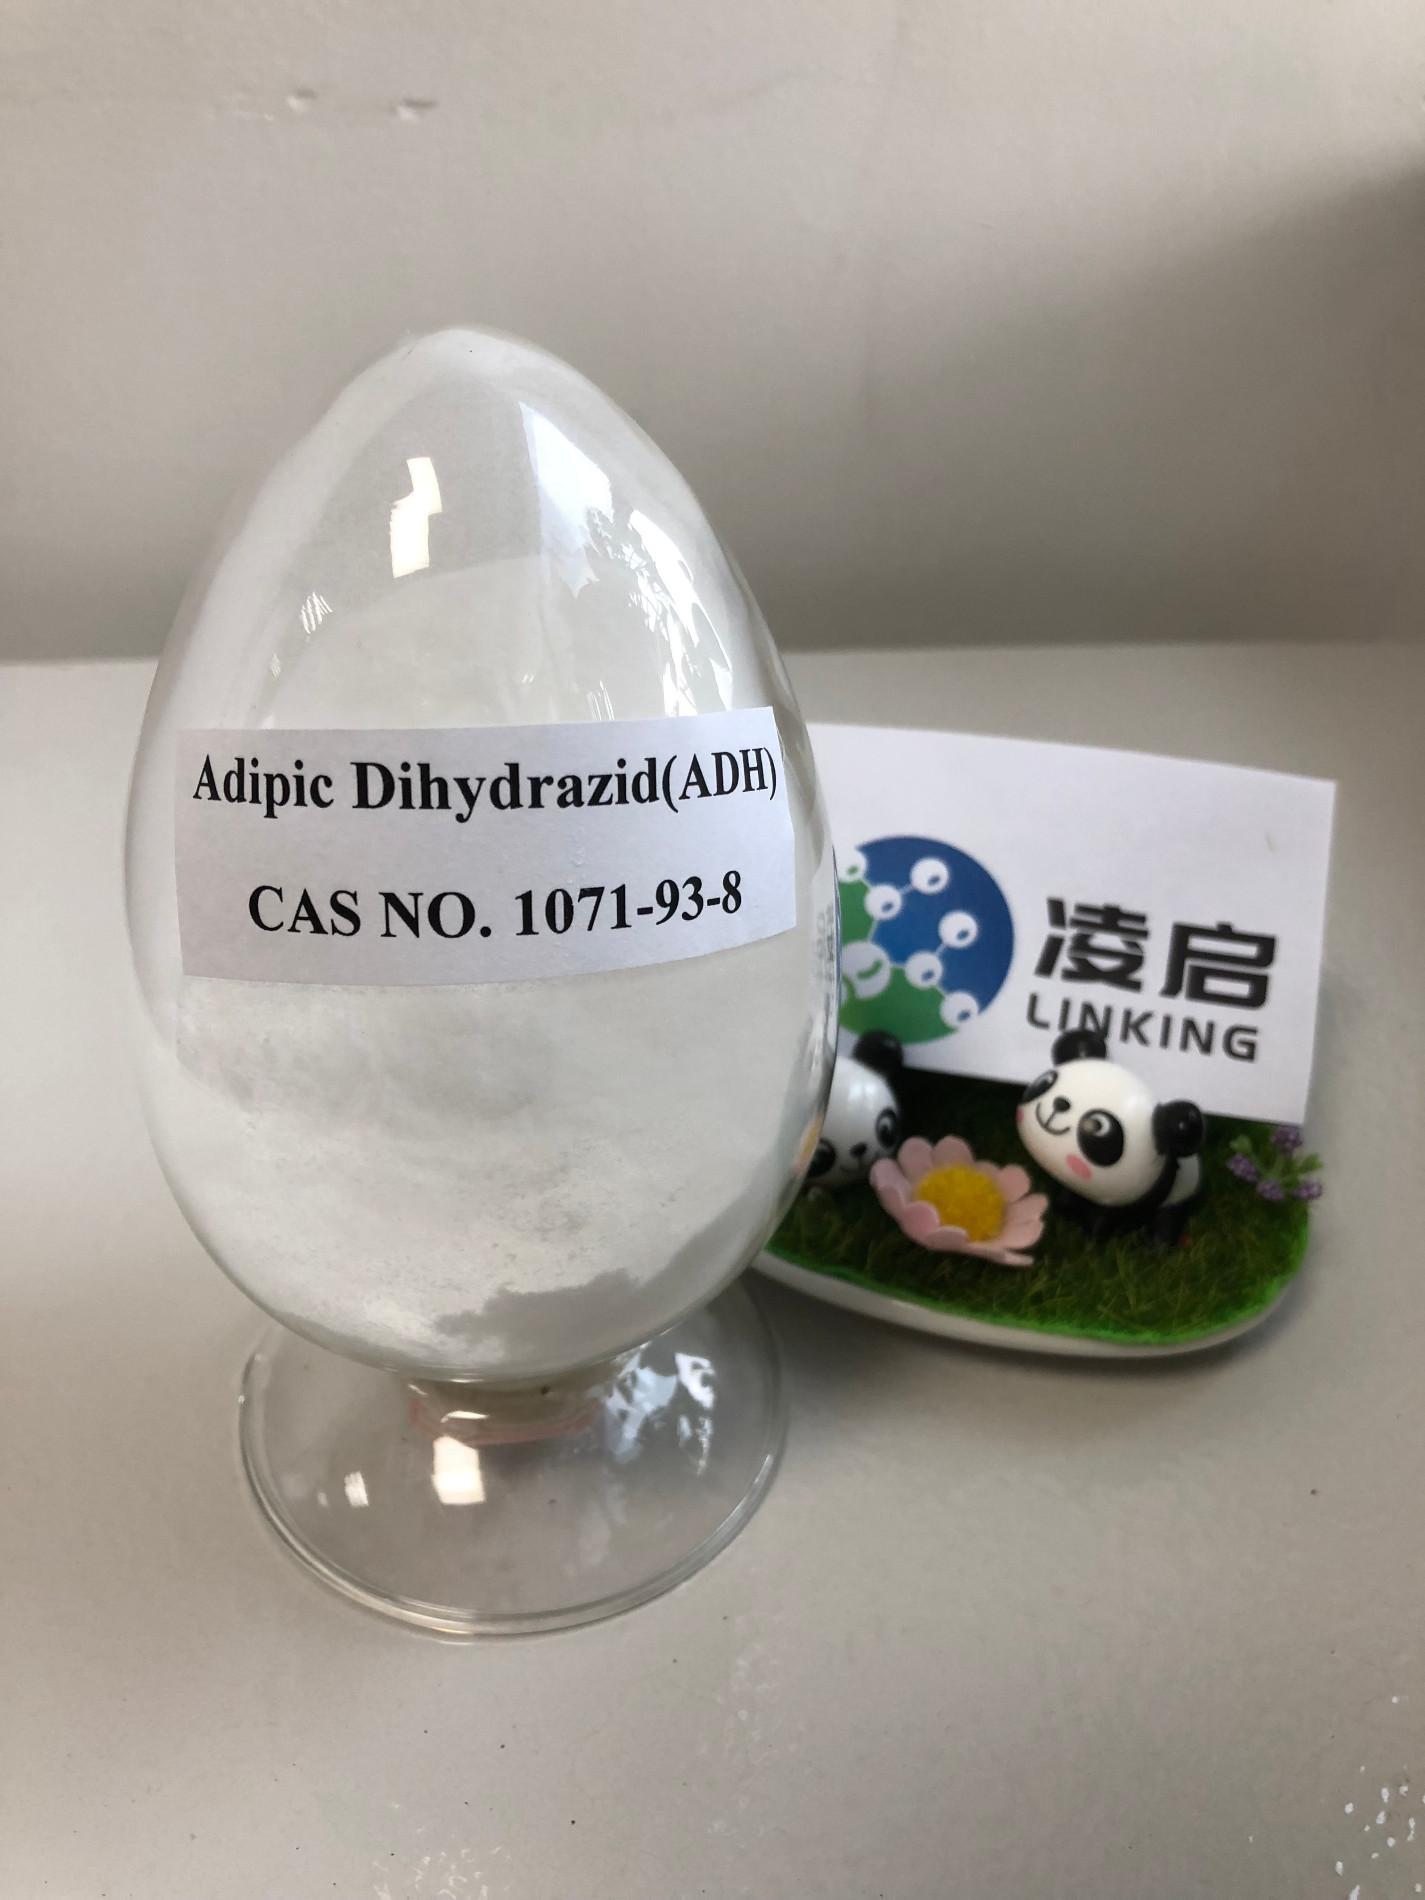 Adipic acid dihyhrazide Manufacturers, Adipic acid dihyhrazide Factory, Supply Adipic acid dihyhrazide